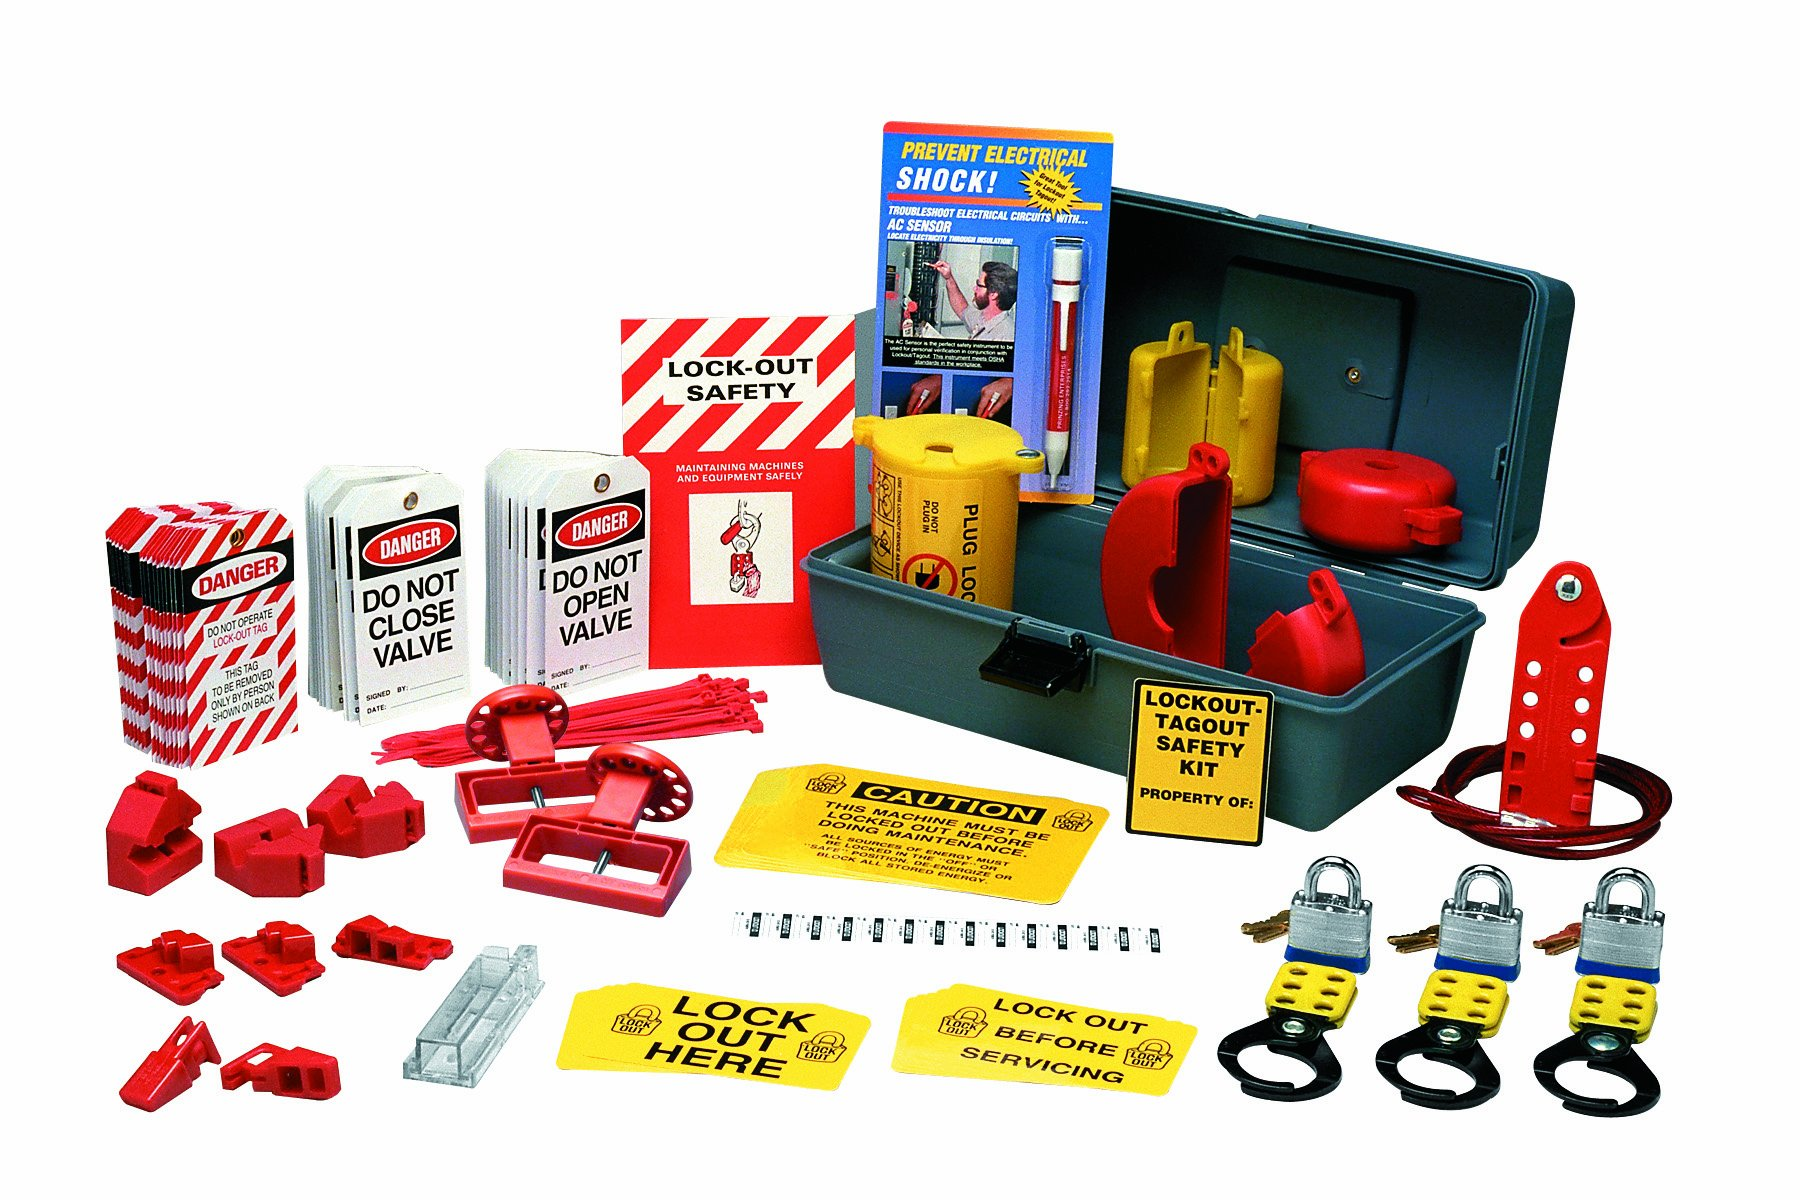 Brady LKXD Prinzing Deluxe Lockout Kit (1 Kit)